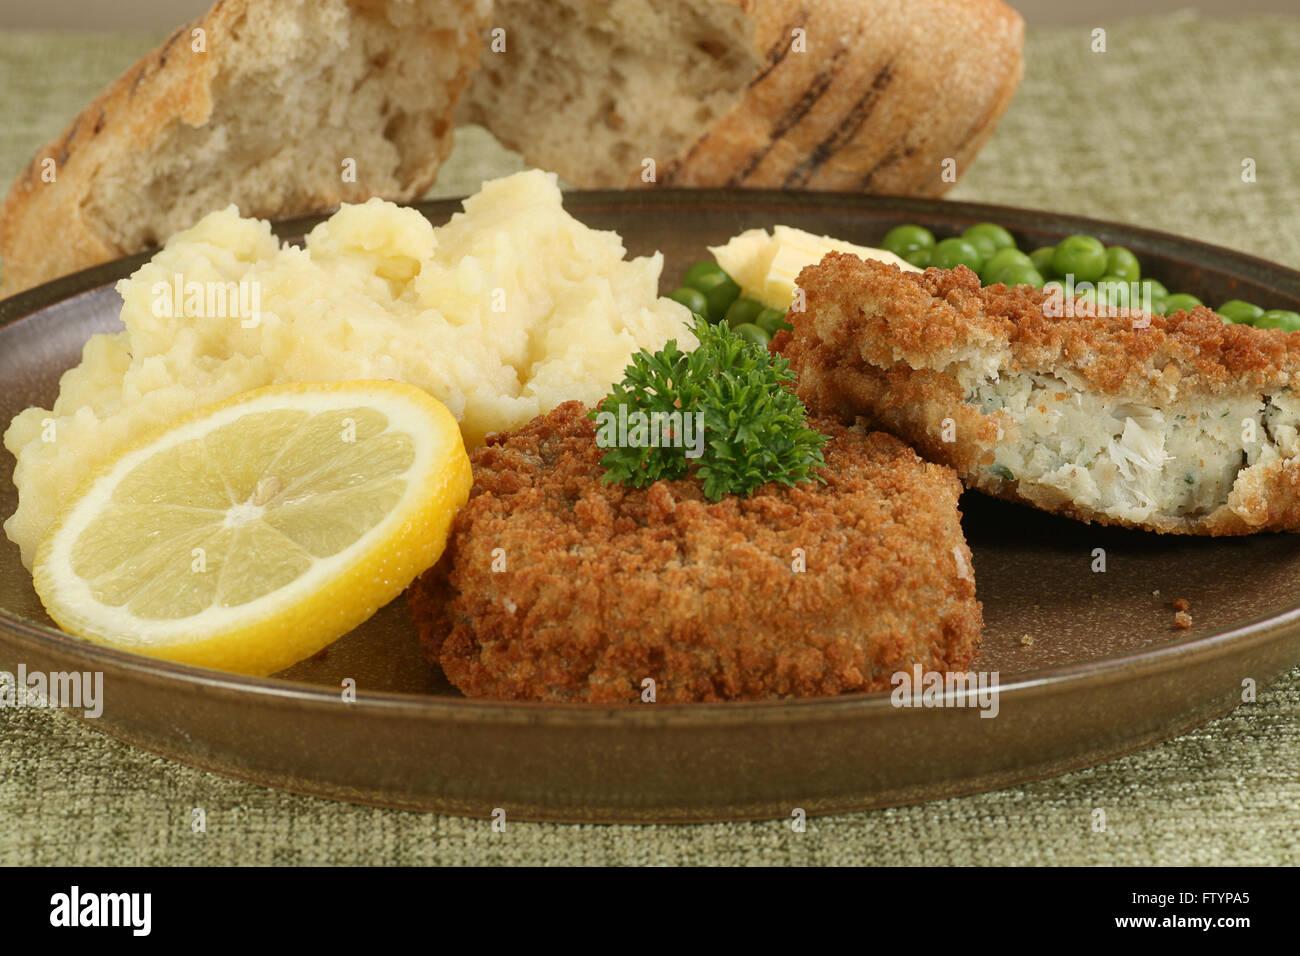 two fresh cod fishcakes with mashed potato and peas - Stock Image